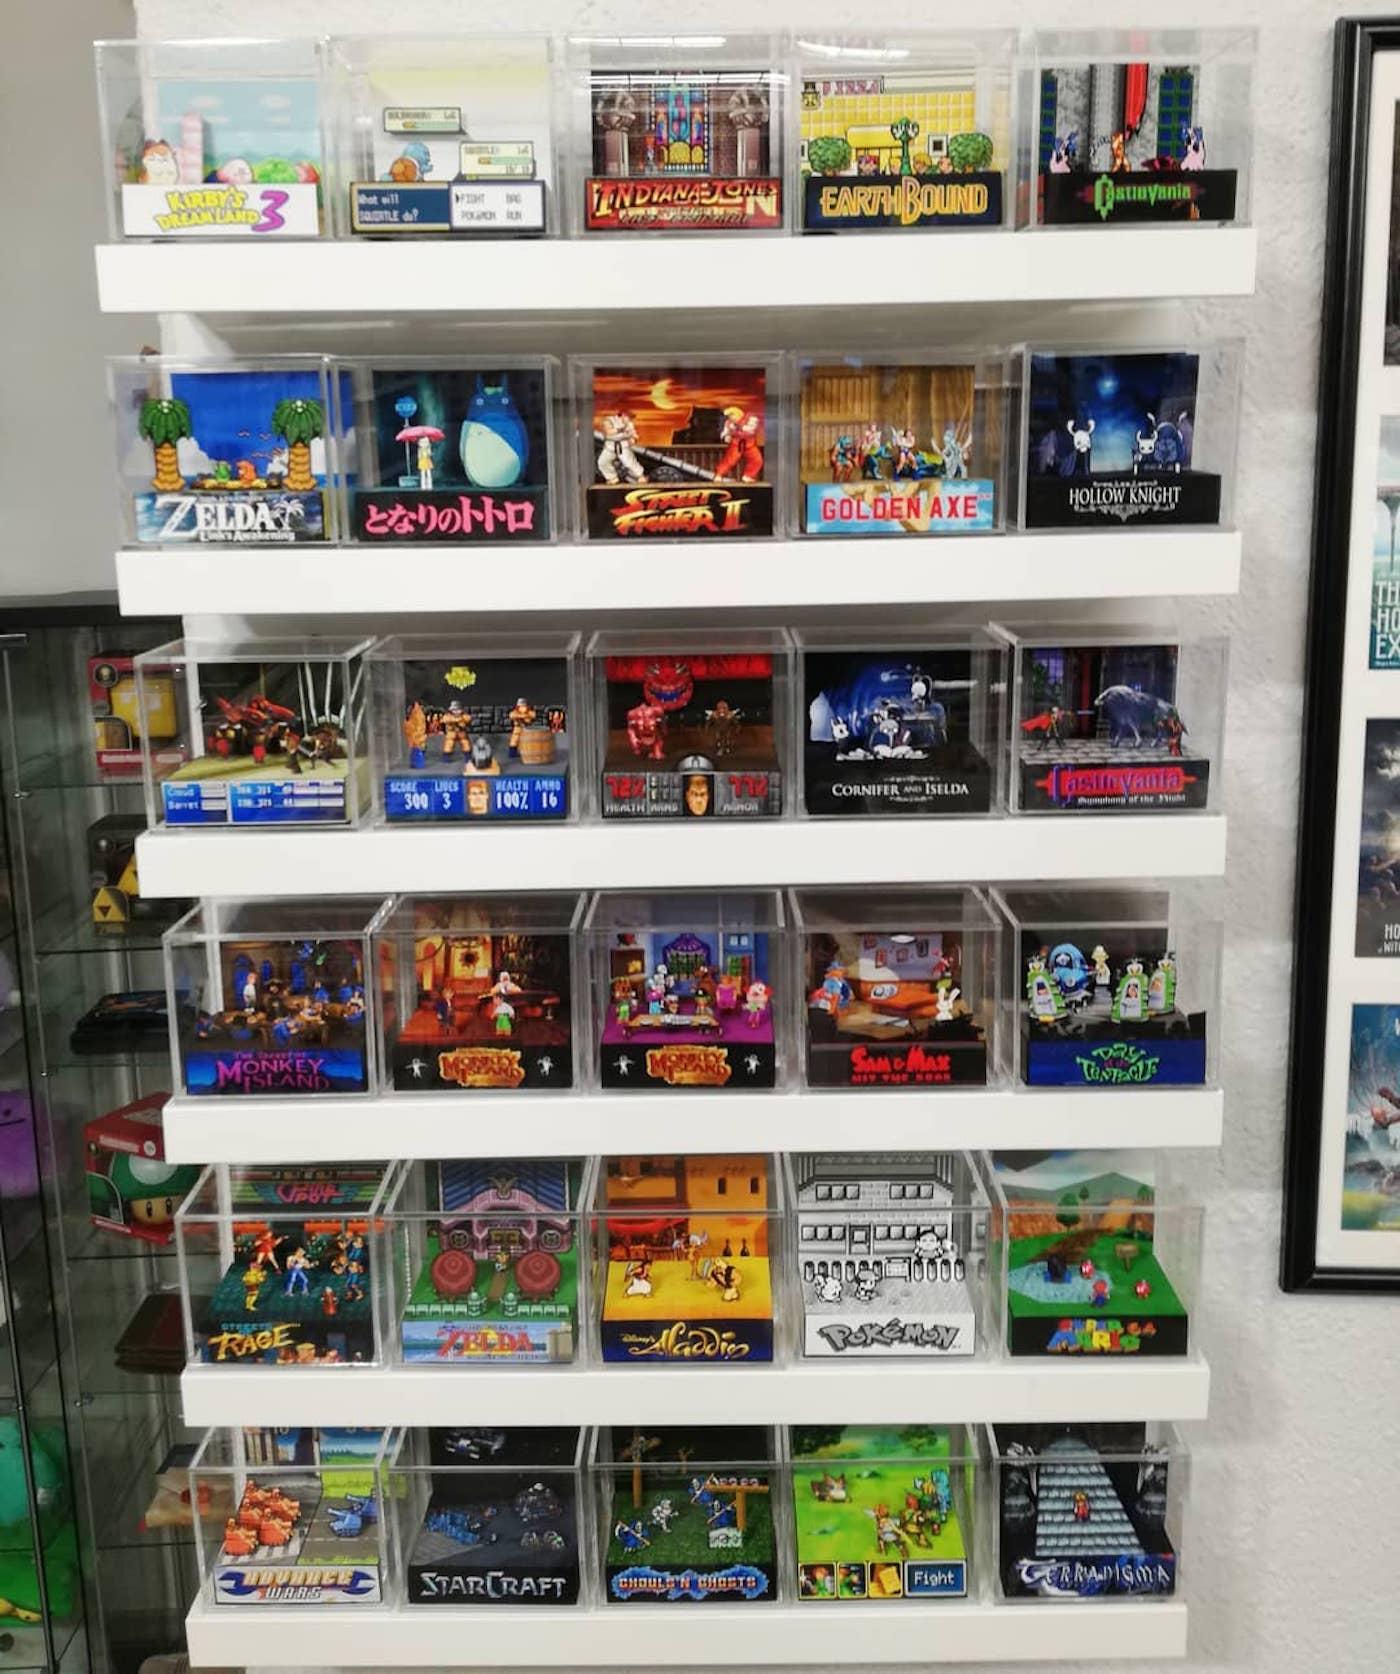 Les merveilles de ARTSMD Arts-md-diorama-cubes-jeux-retro-gameboy-5